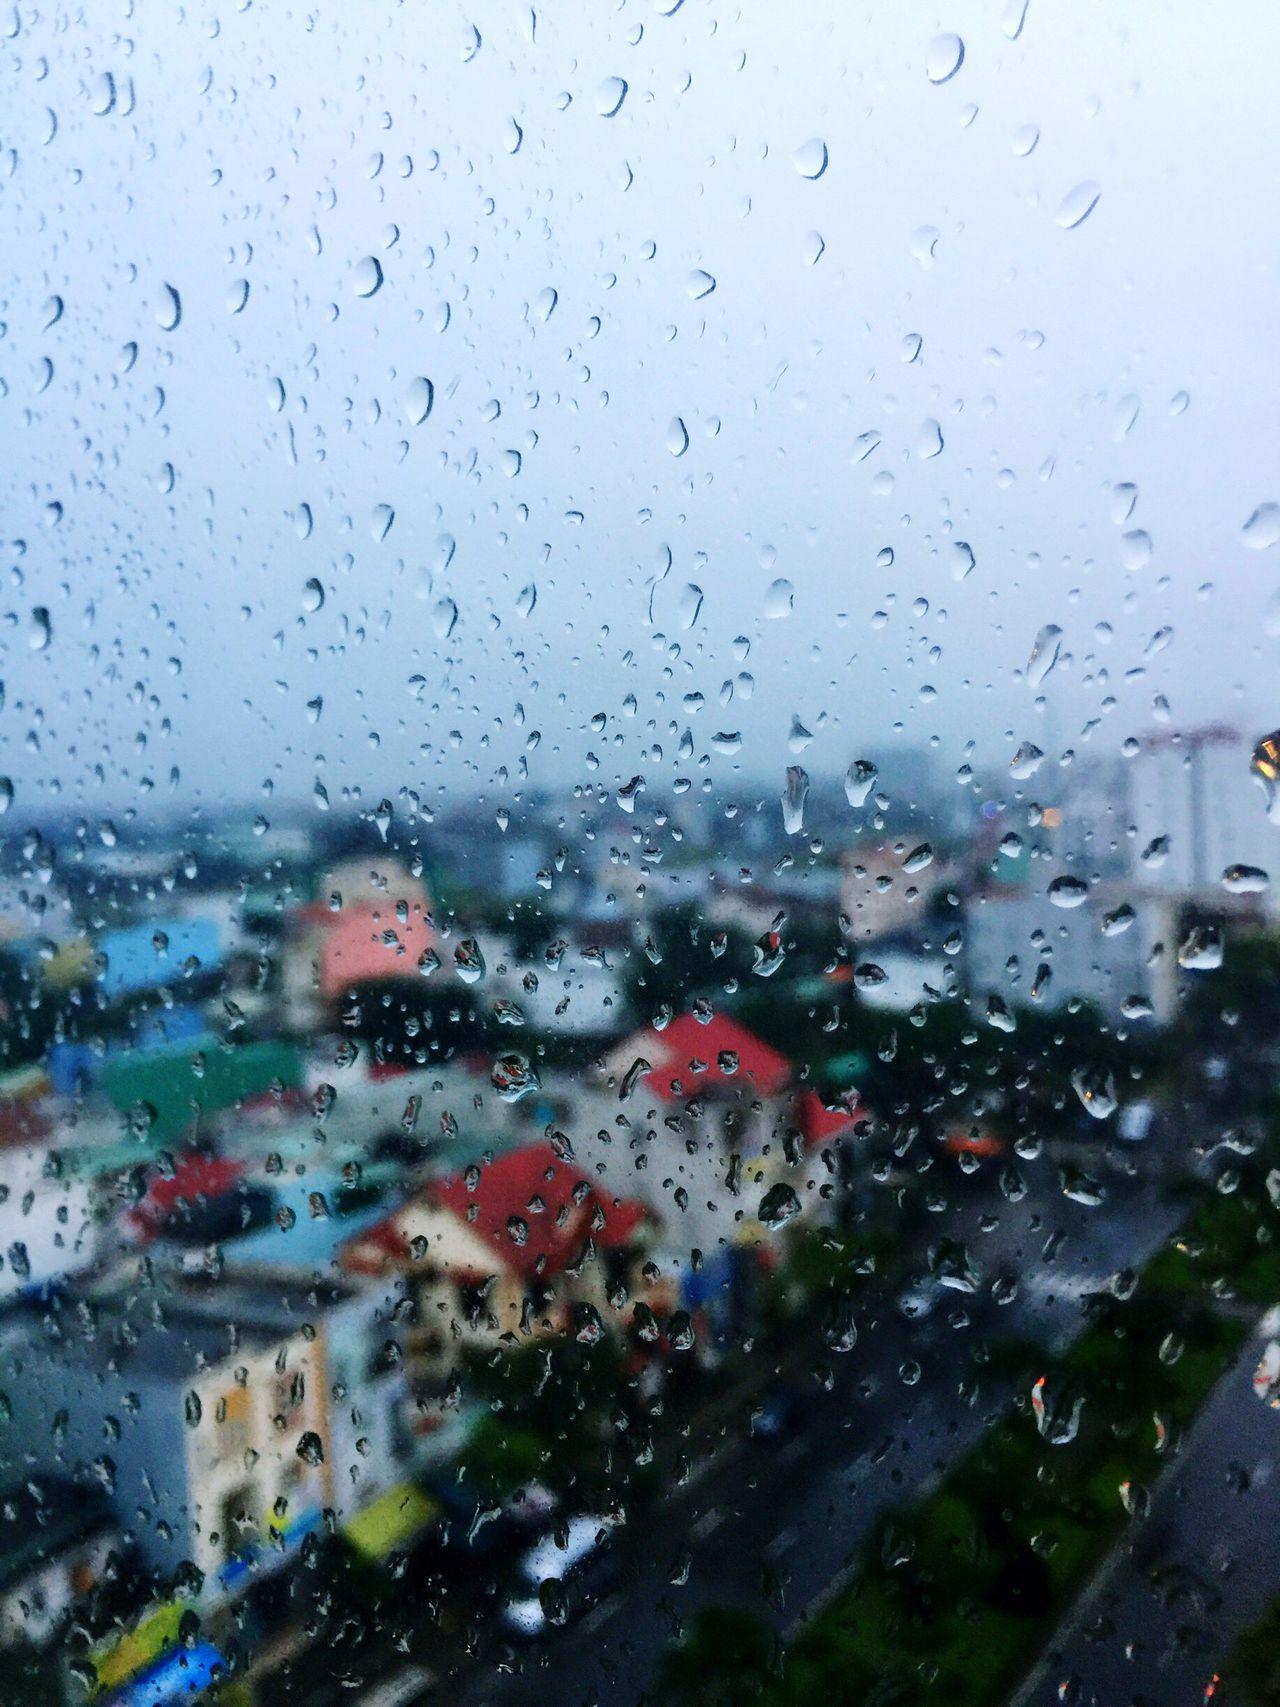 Sea Phoenix Hotel Danangcity, Vietnam Rainy Day Window View Rain Drops No People Sky City View  2017 New Year Wet Winter